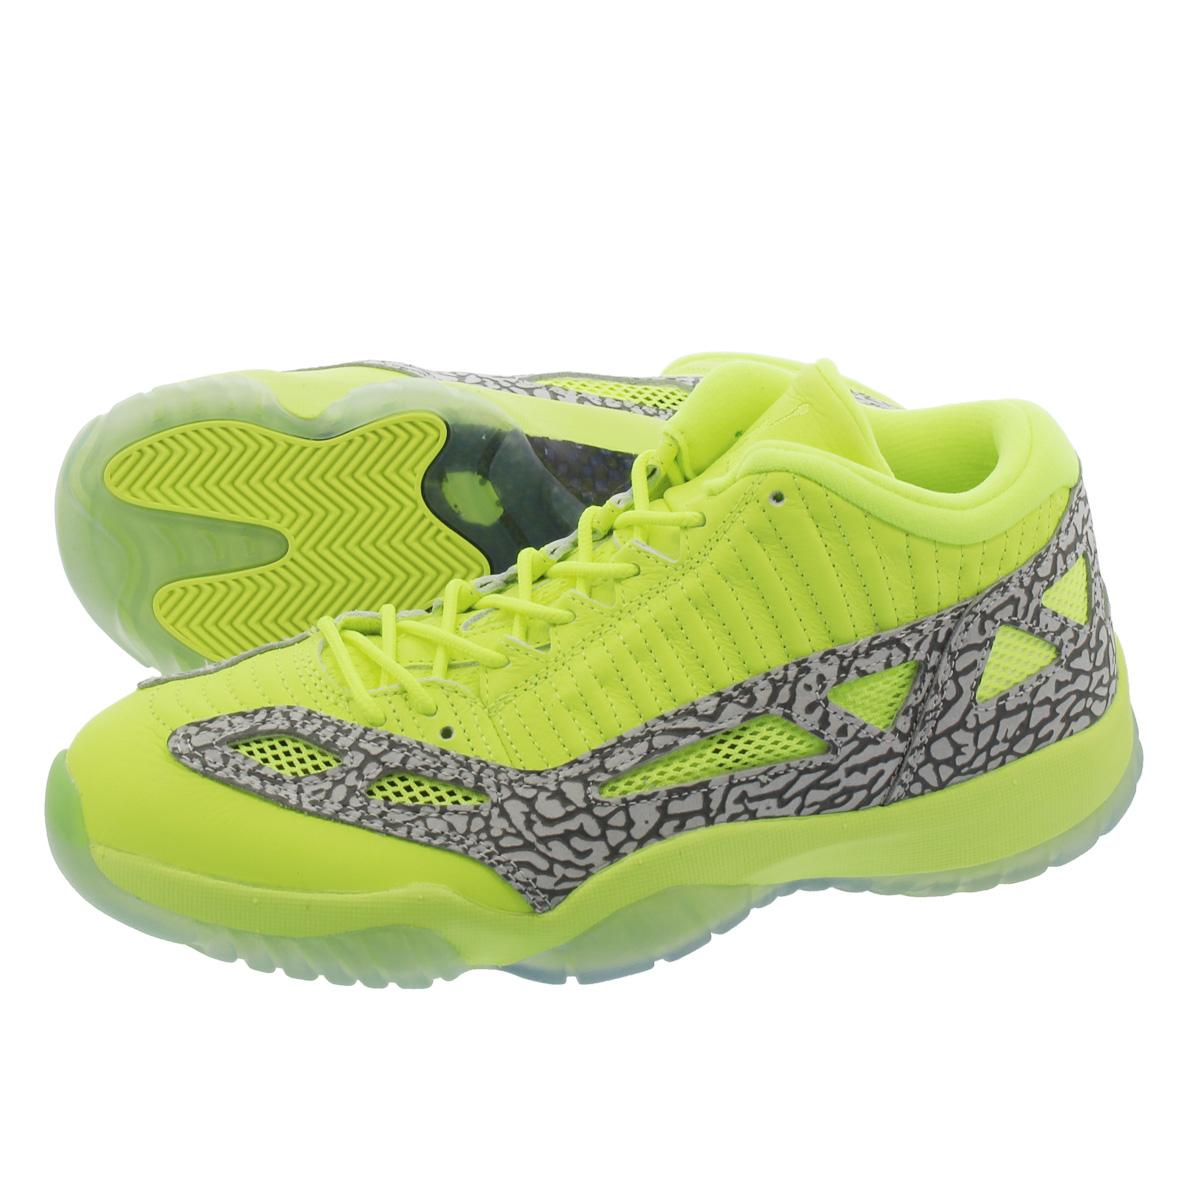 2768ebd79cfc NIKE AIR JORDAN 11 RETRO LOW IE Nike Air Jordan 11 nostalgic low VOLT CEMENT  GREY 919